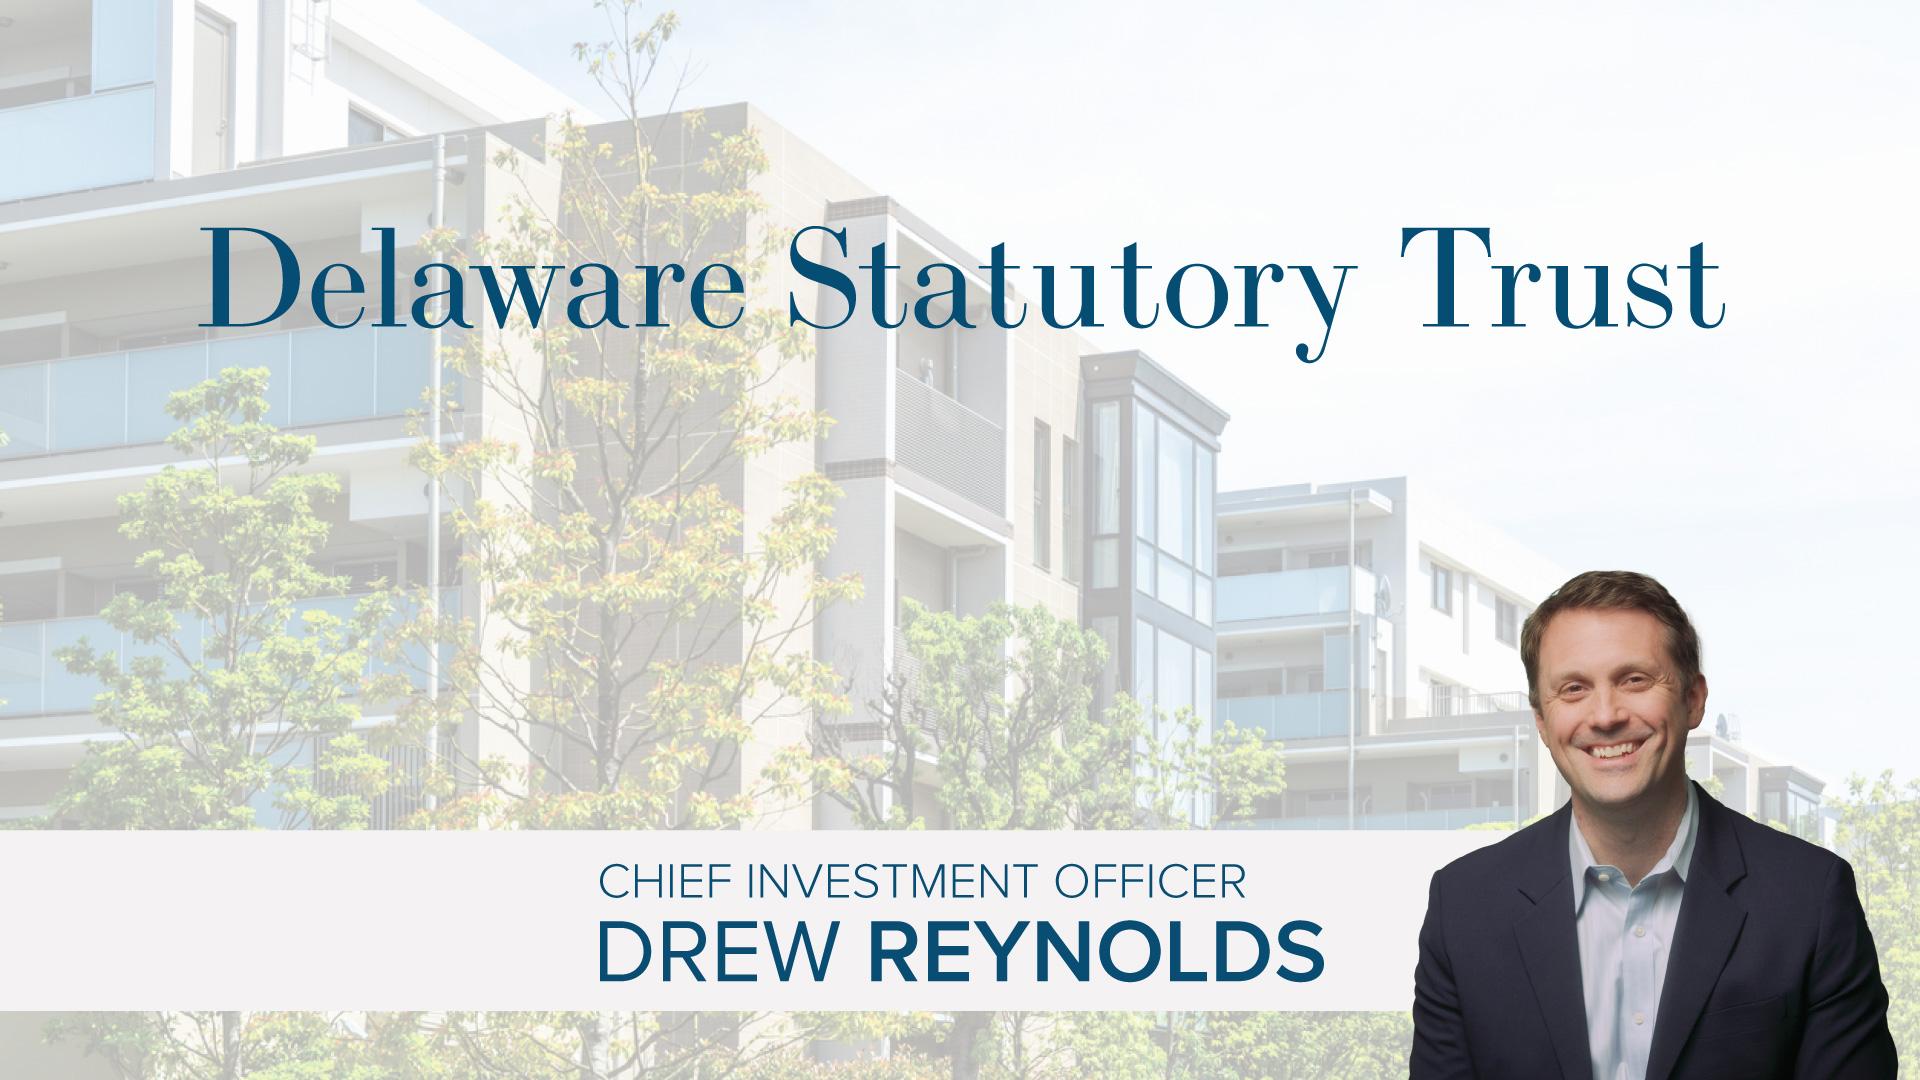 03-delaware-statutory-trust